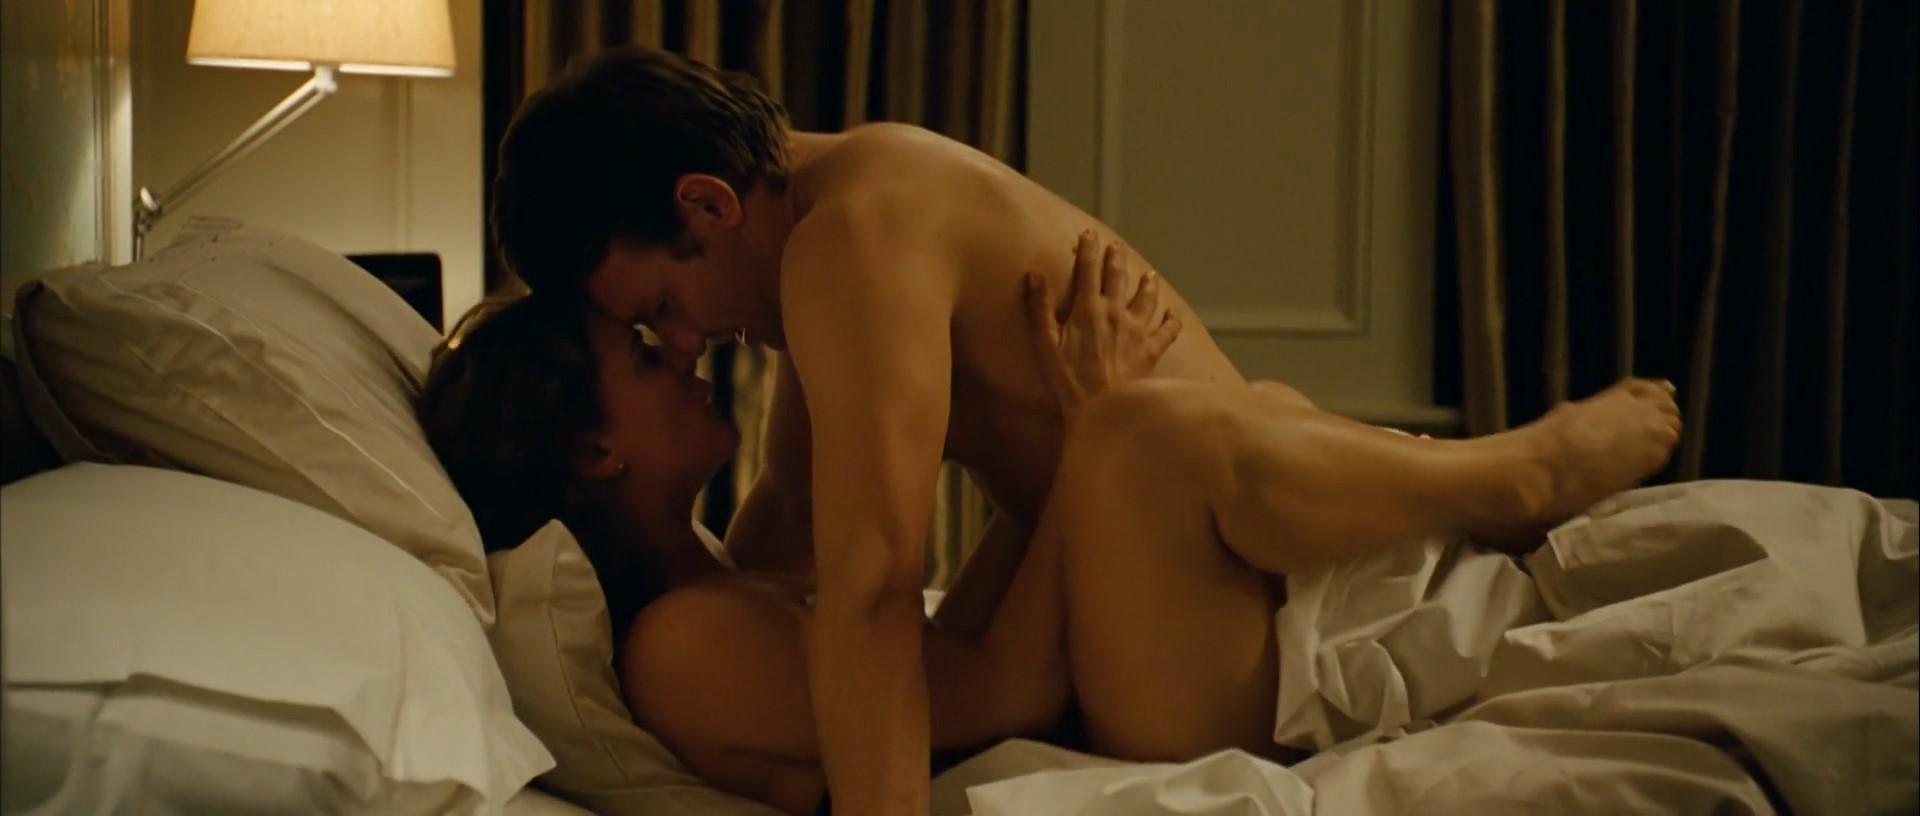 Danielle savre topless